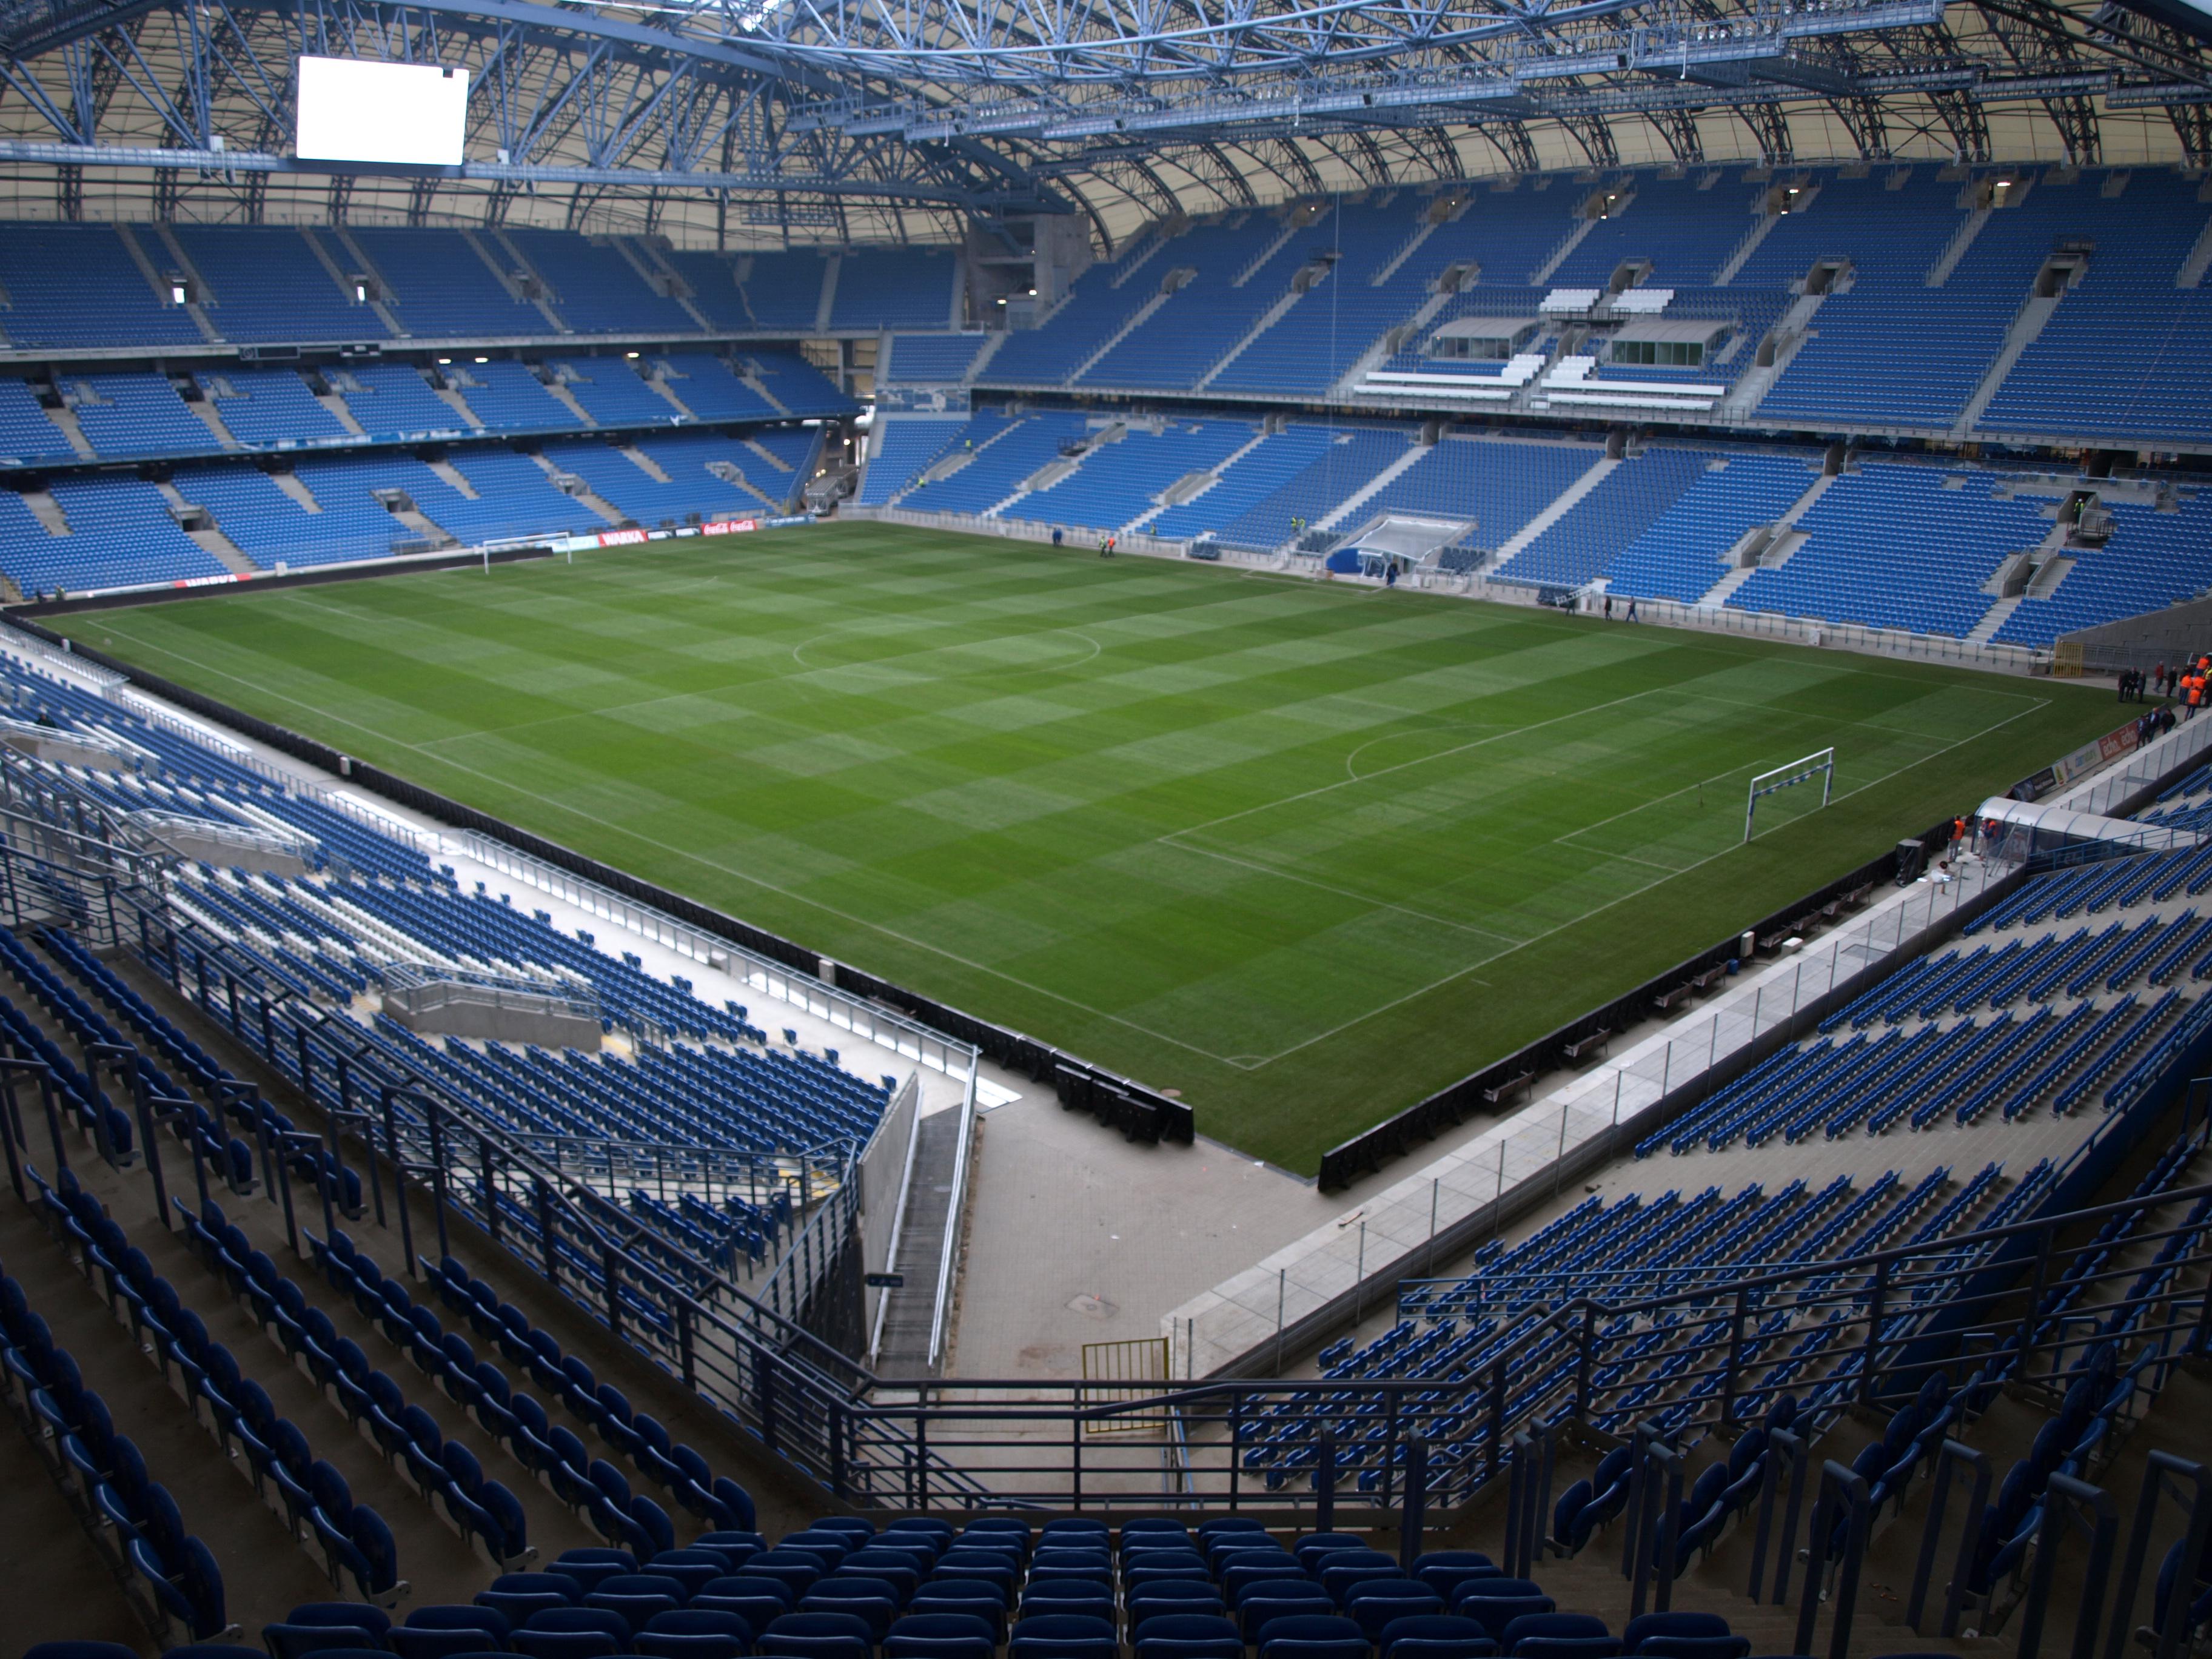 File:Stadion Lecha Poznan. 2010-11-03 (2).JPG - Wikimedia Commons